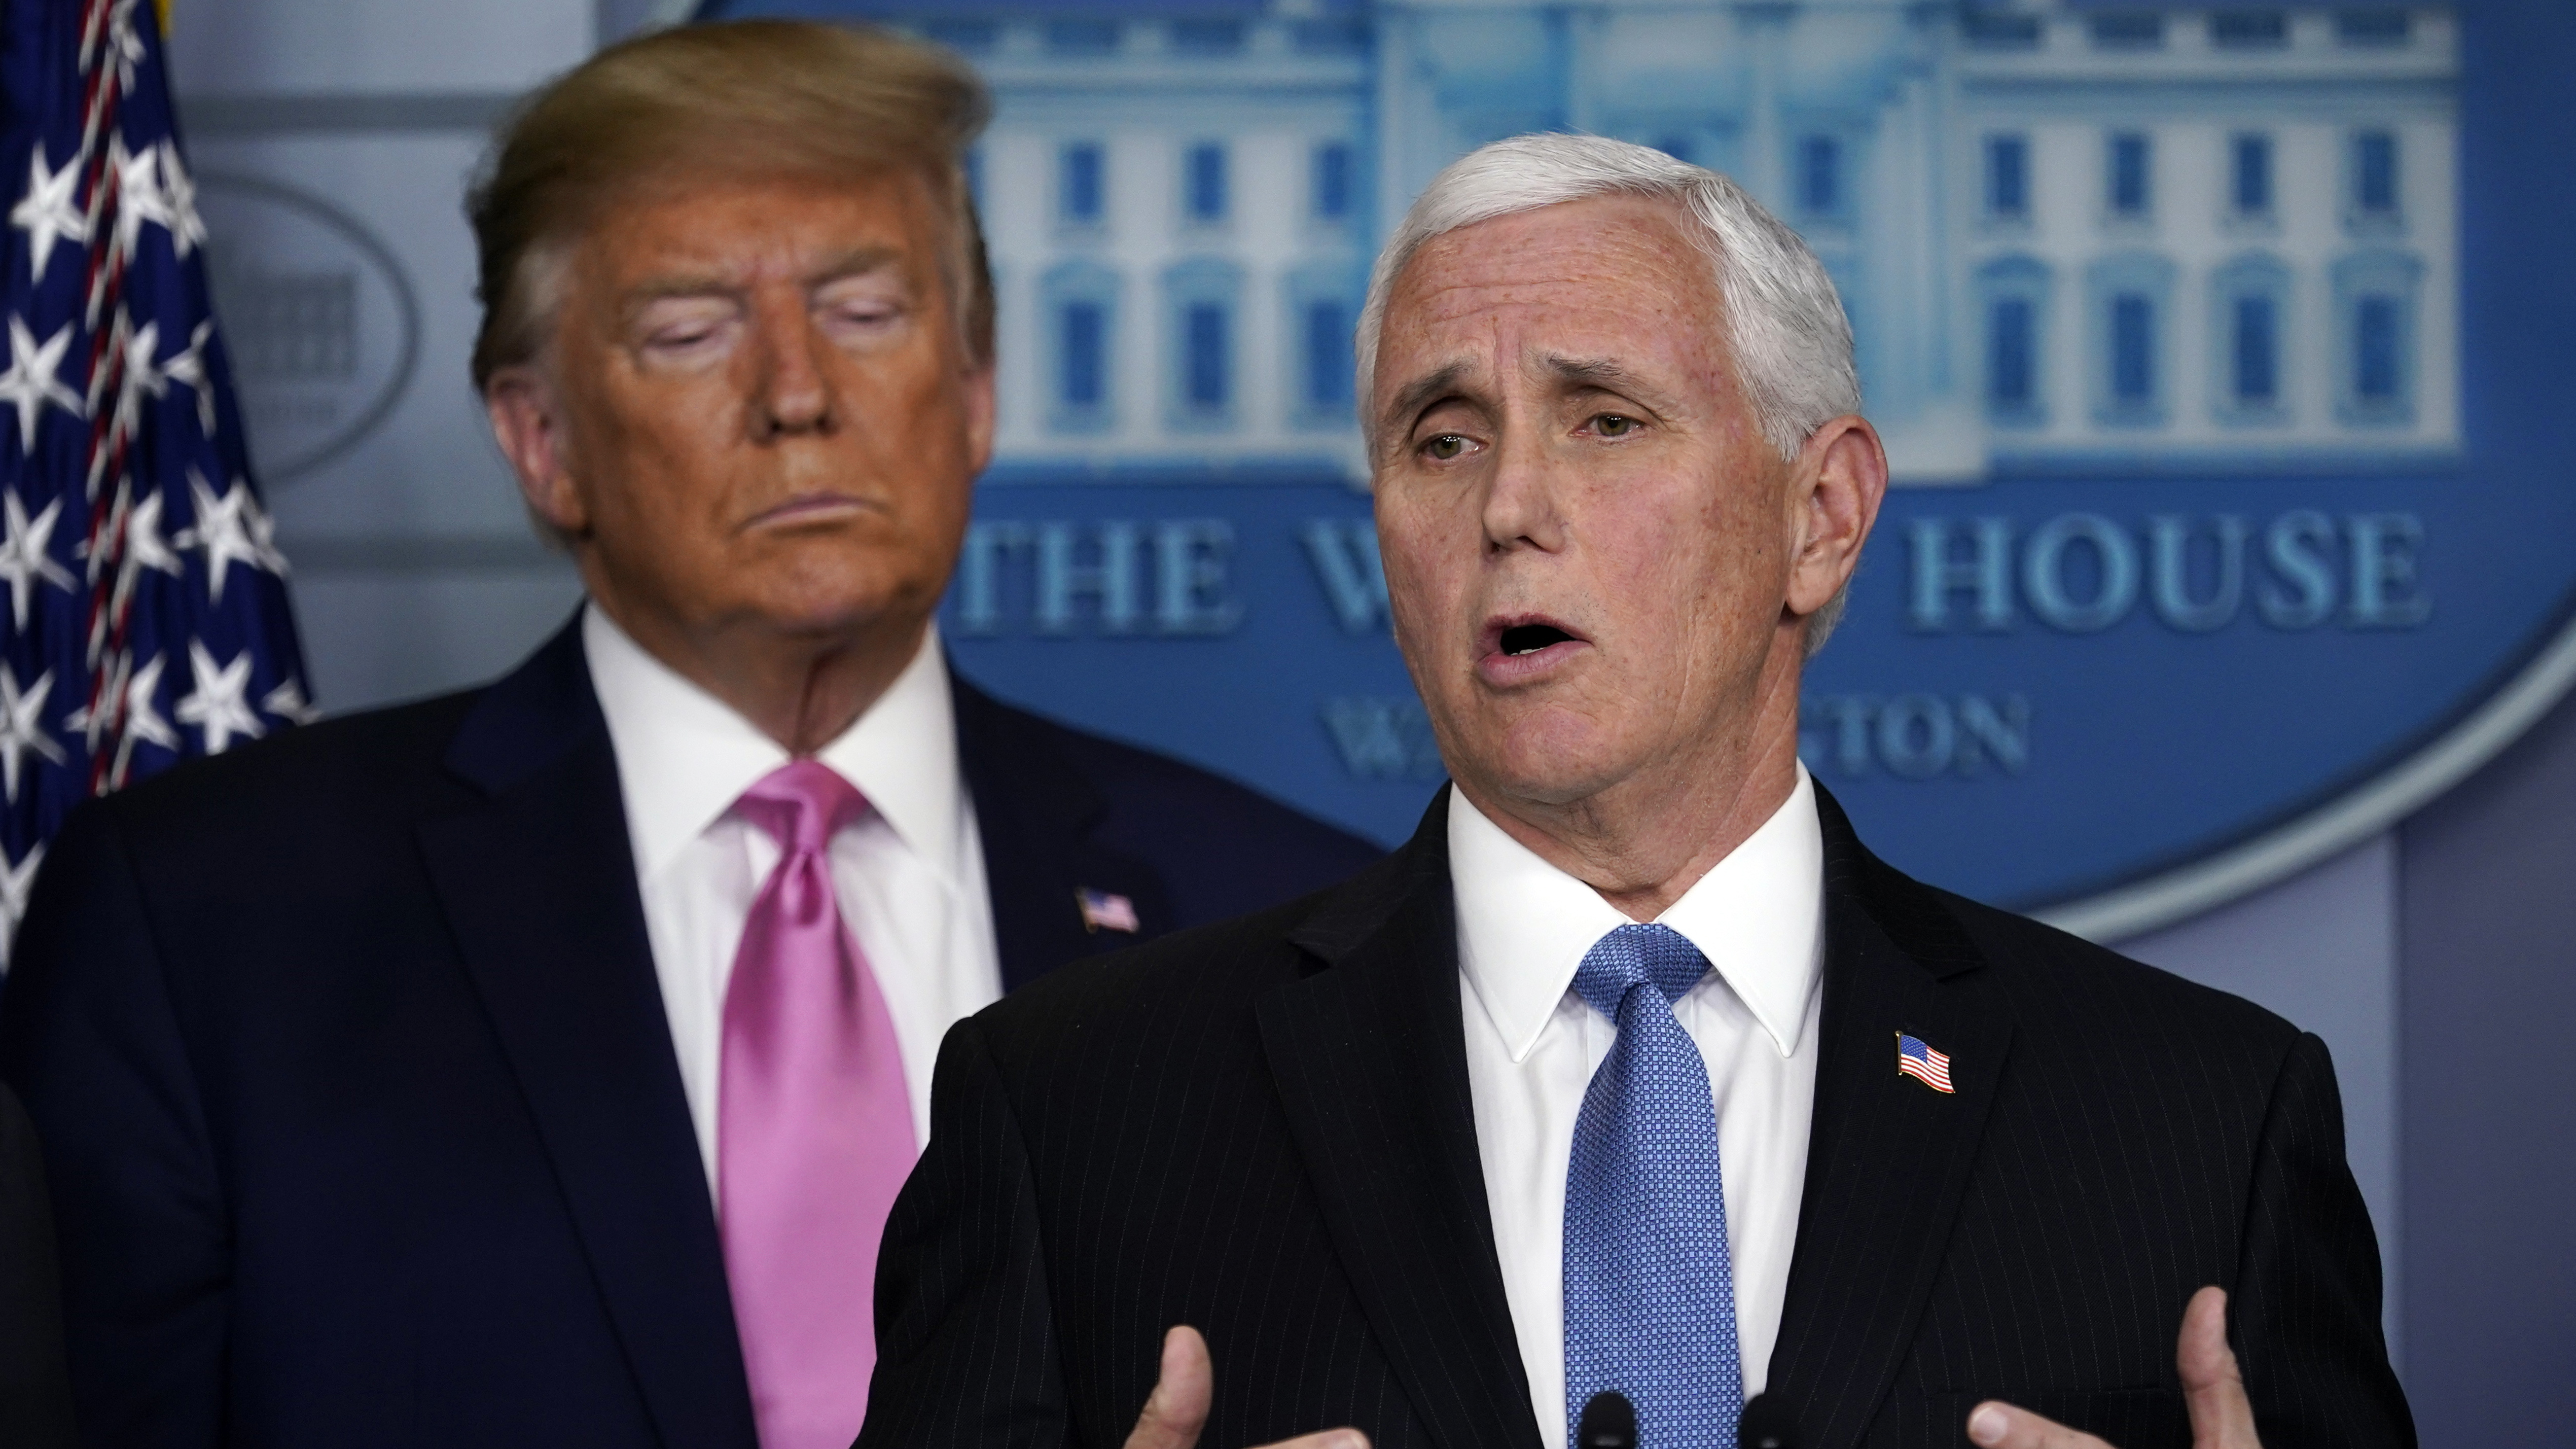 Vice President Pence says Democrats embrace unsafe socialism